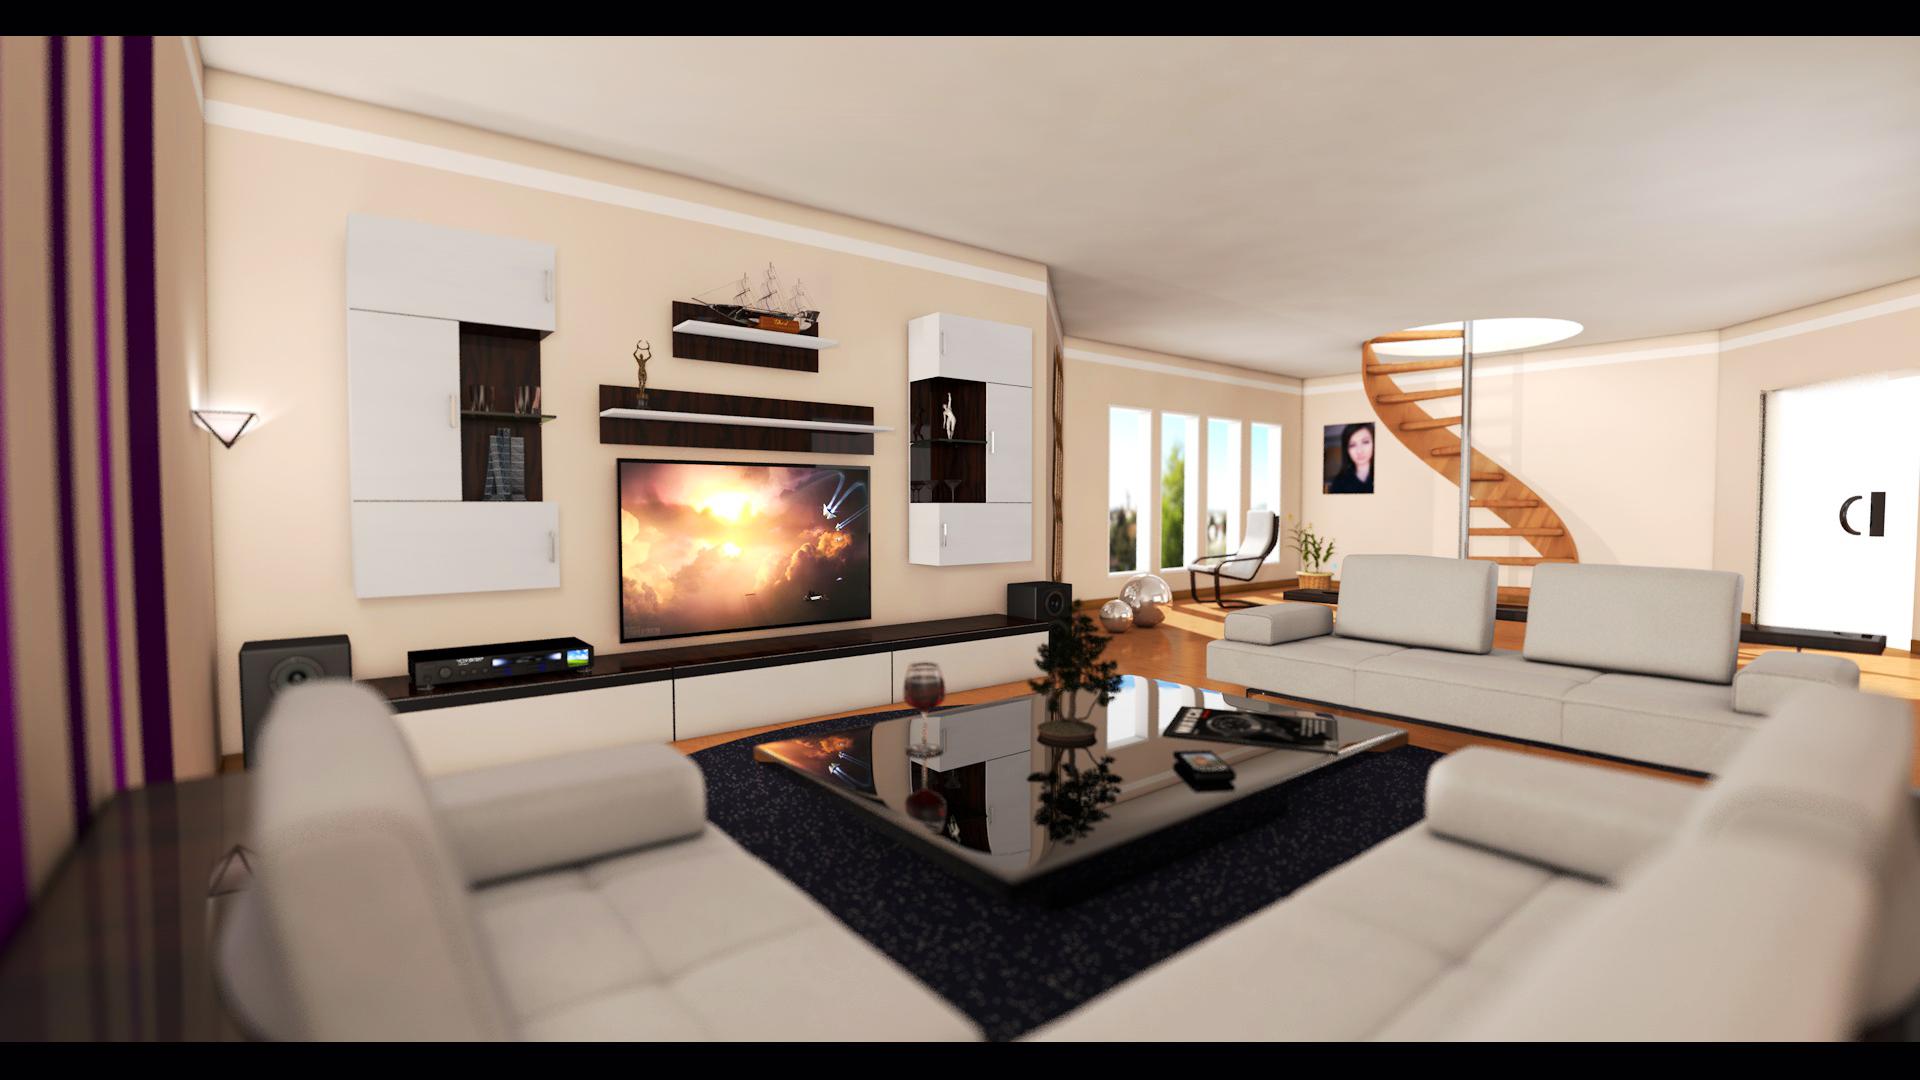 Kumpulan Desain Ruang Tamu 4 X 6 Terbaik